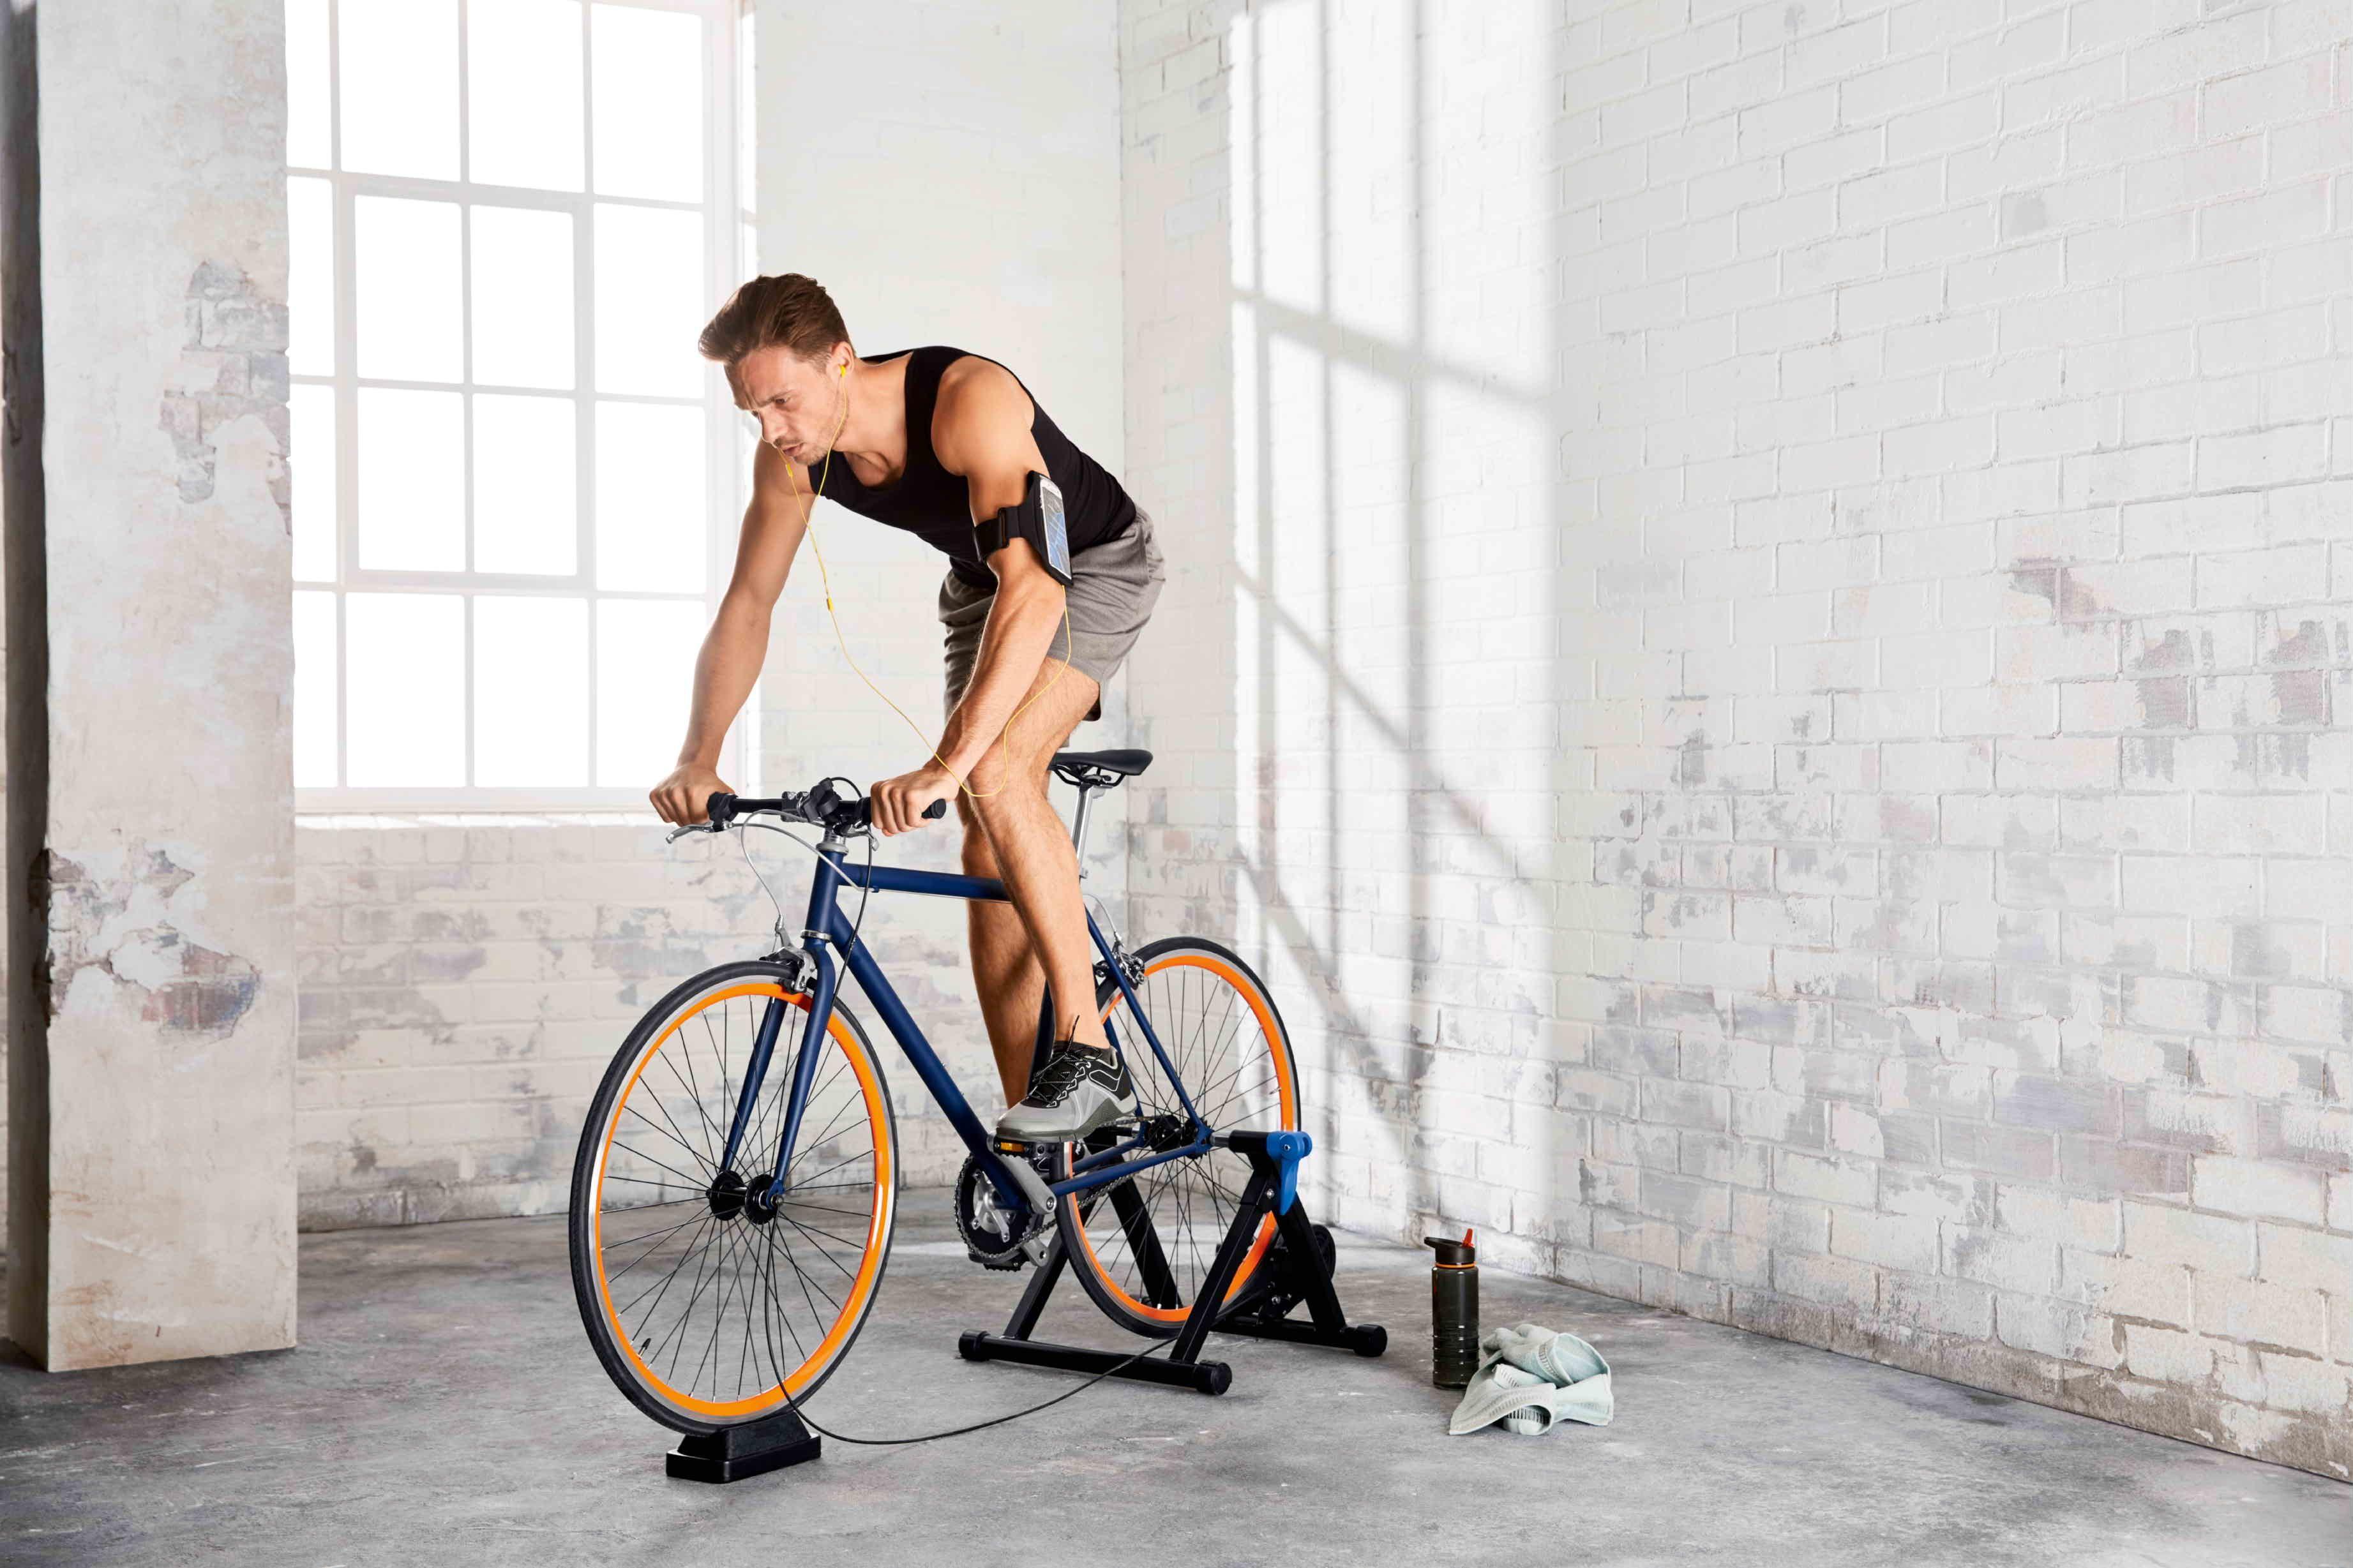 40% off Crivit Indoor Bike Trainer £29.99 - Lidl Brooklands MK